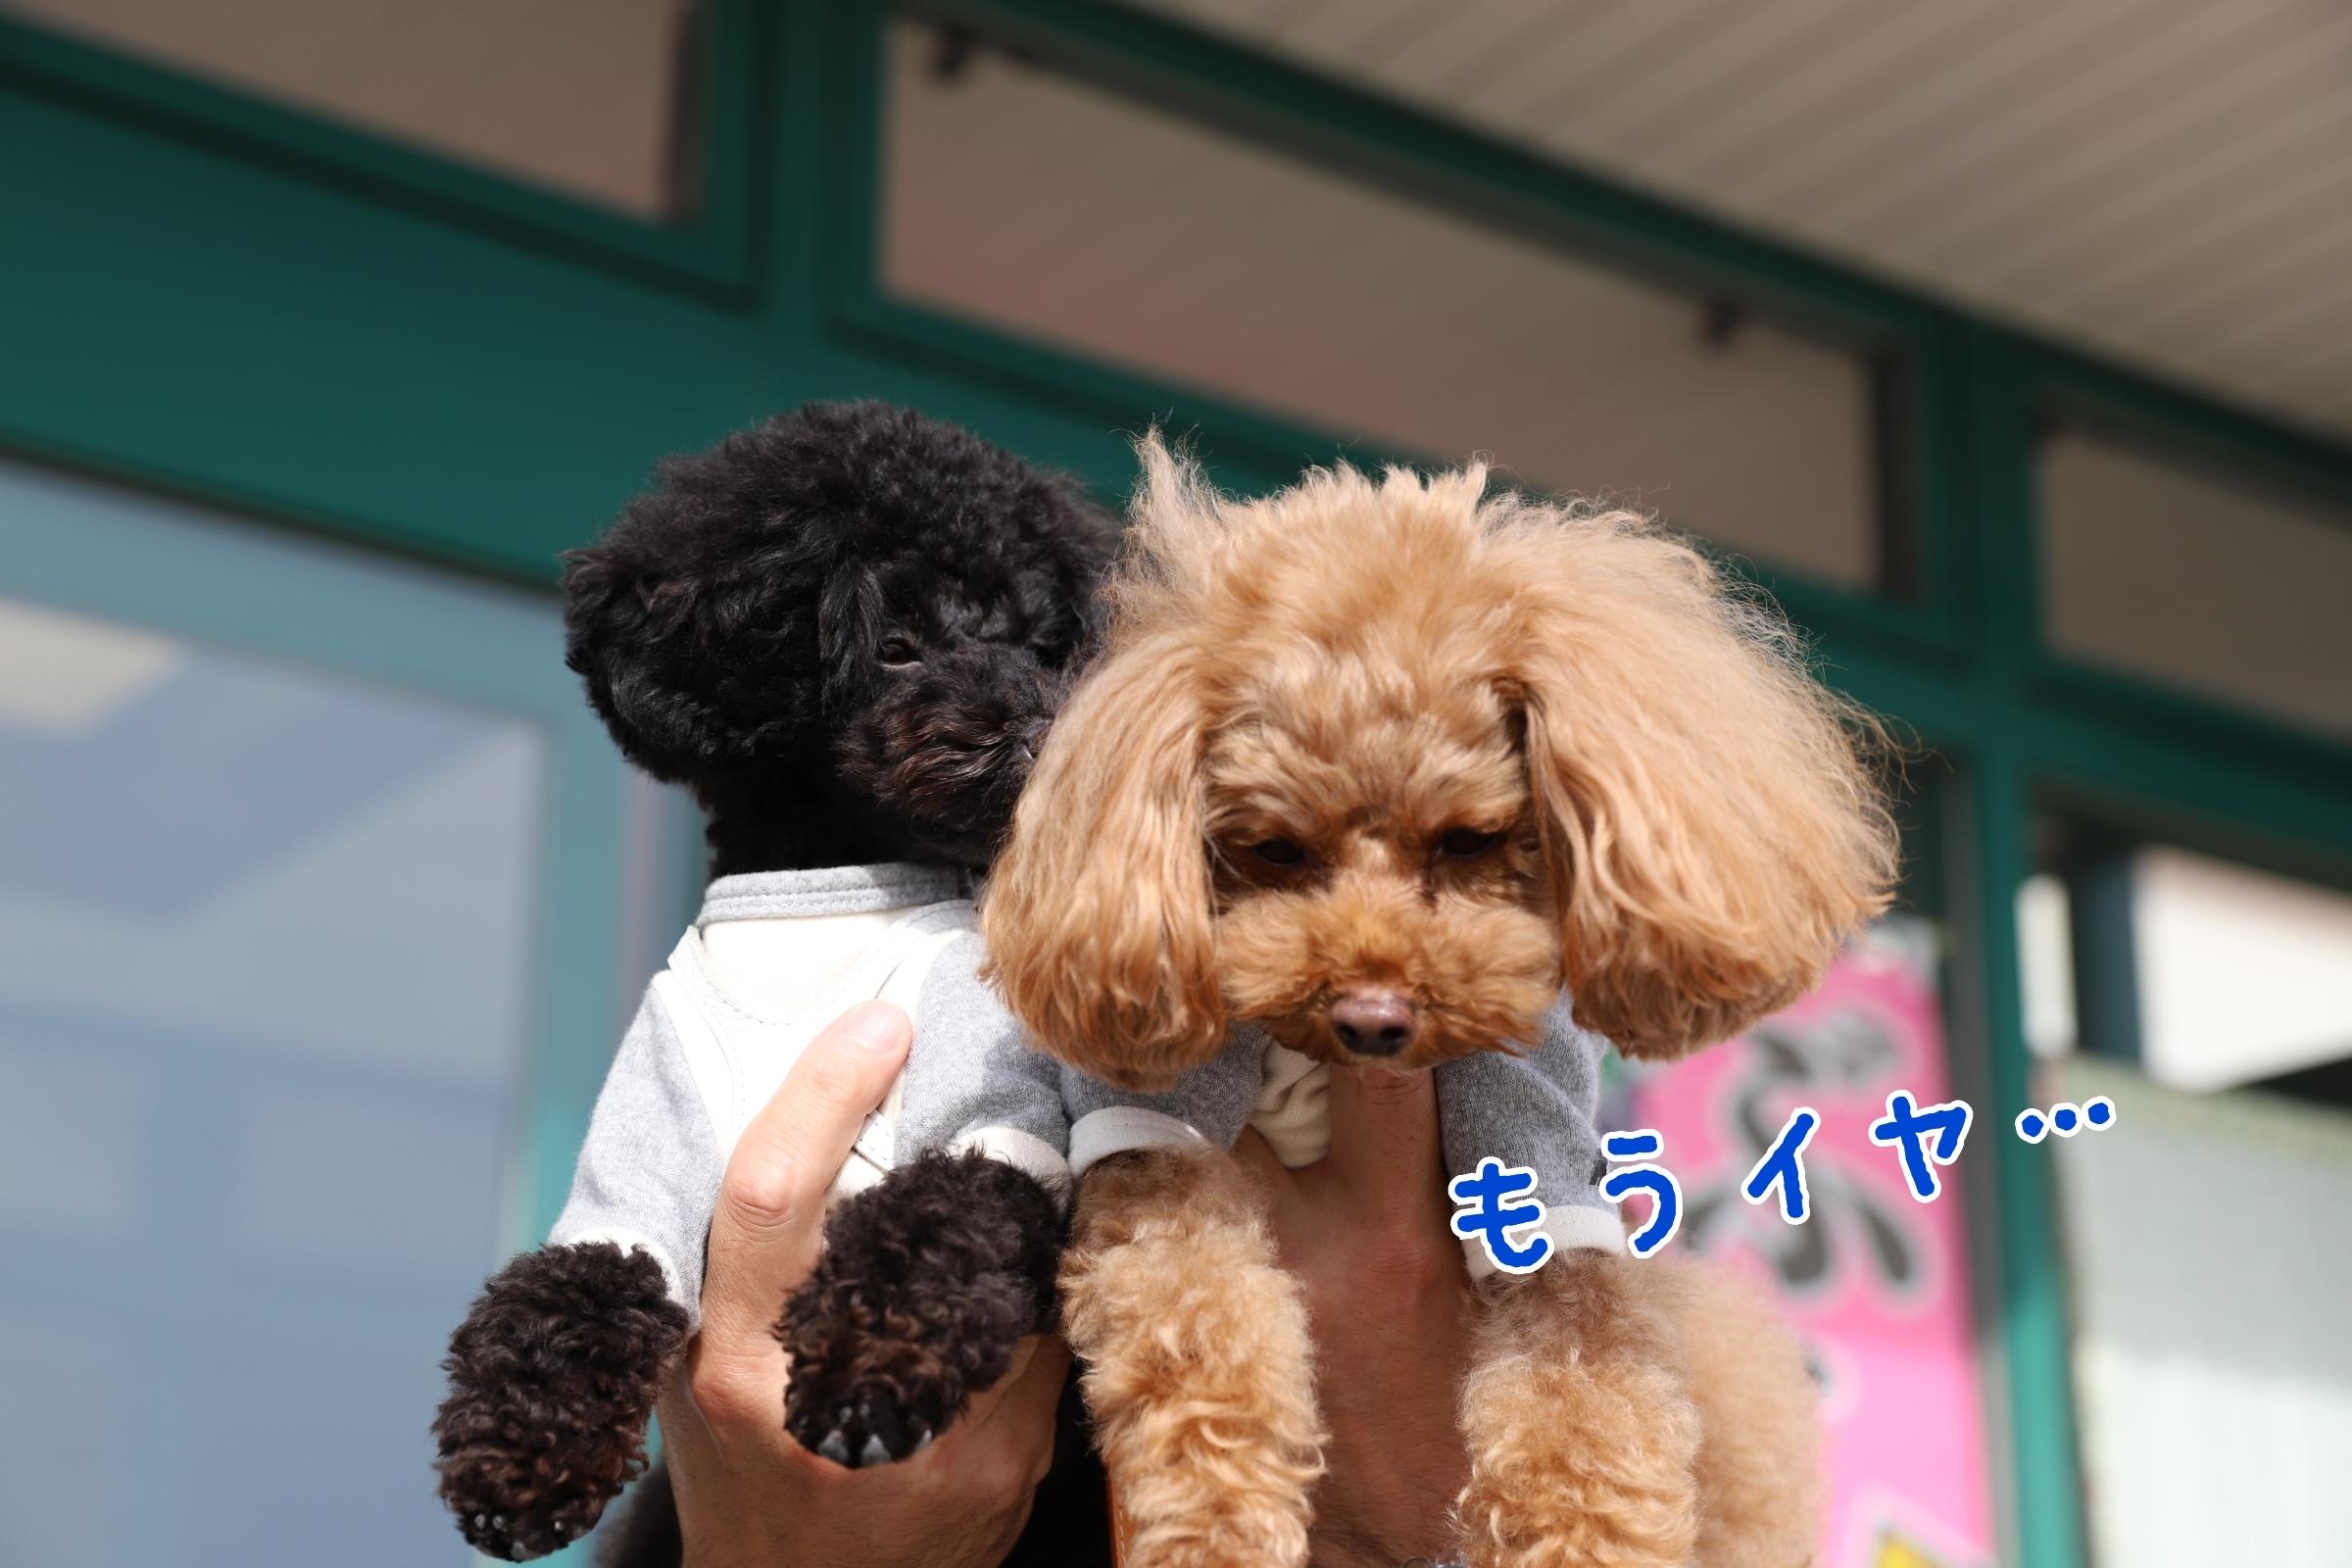 20-02-04-13-24-37-176_deco.jpg